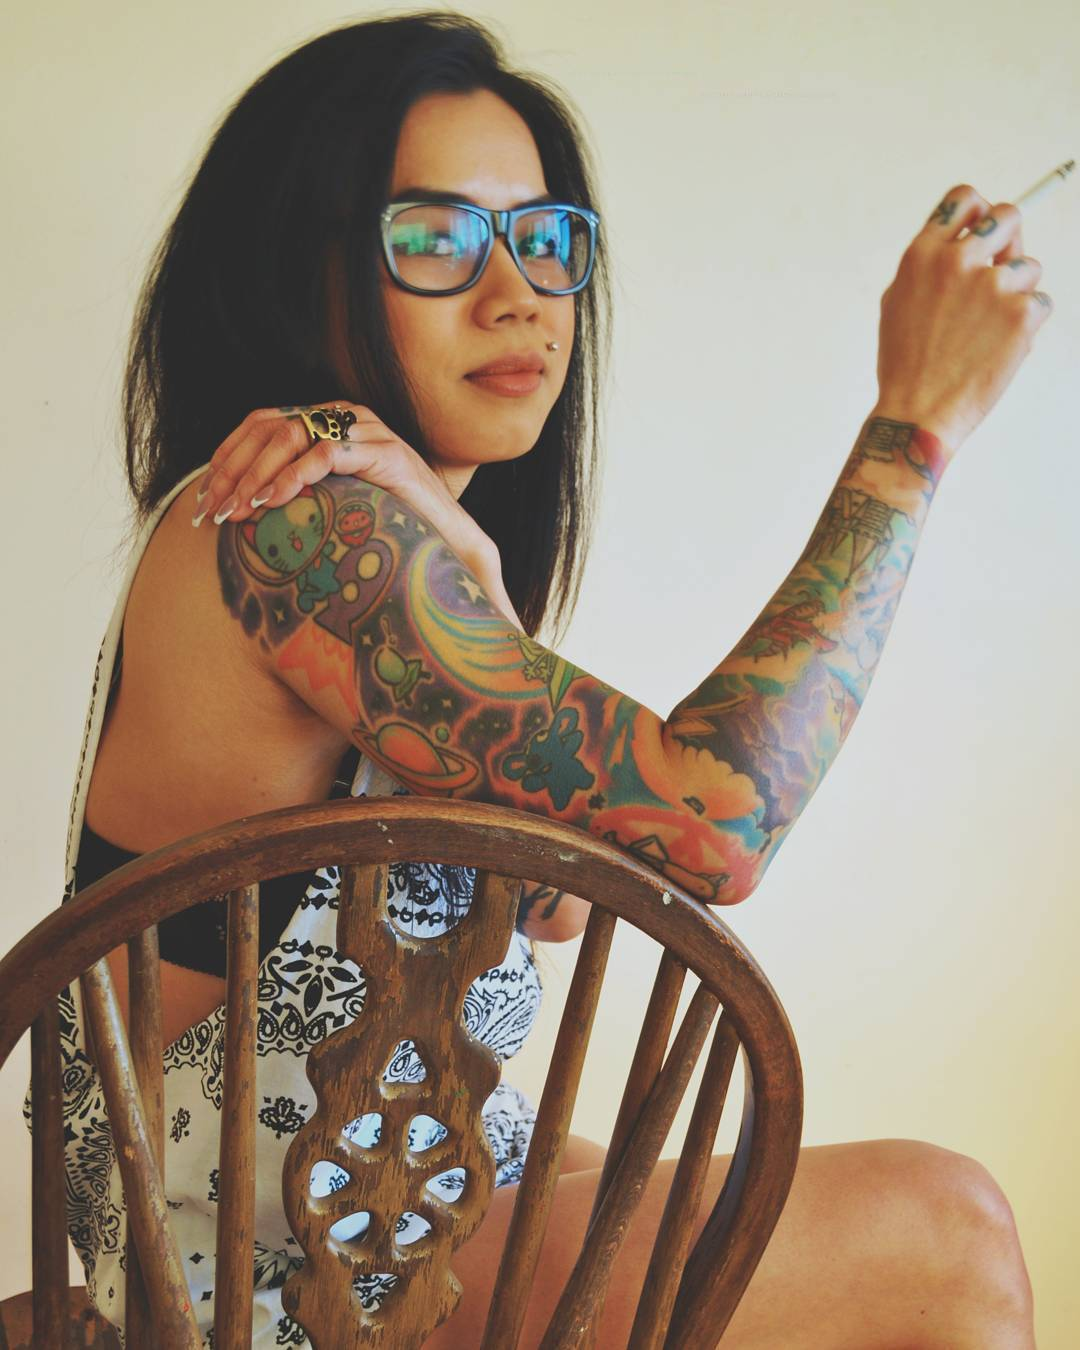 45 Artistically Express Yourself Through Full Sleeve